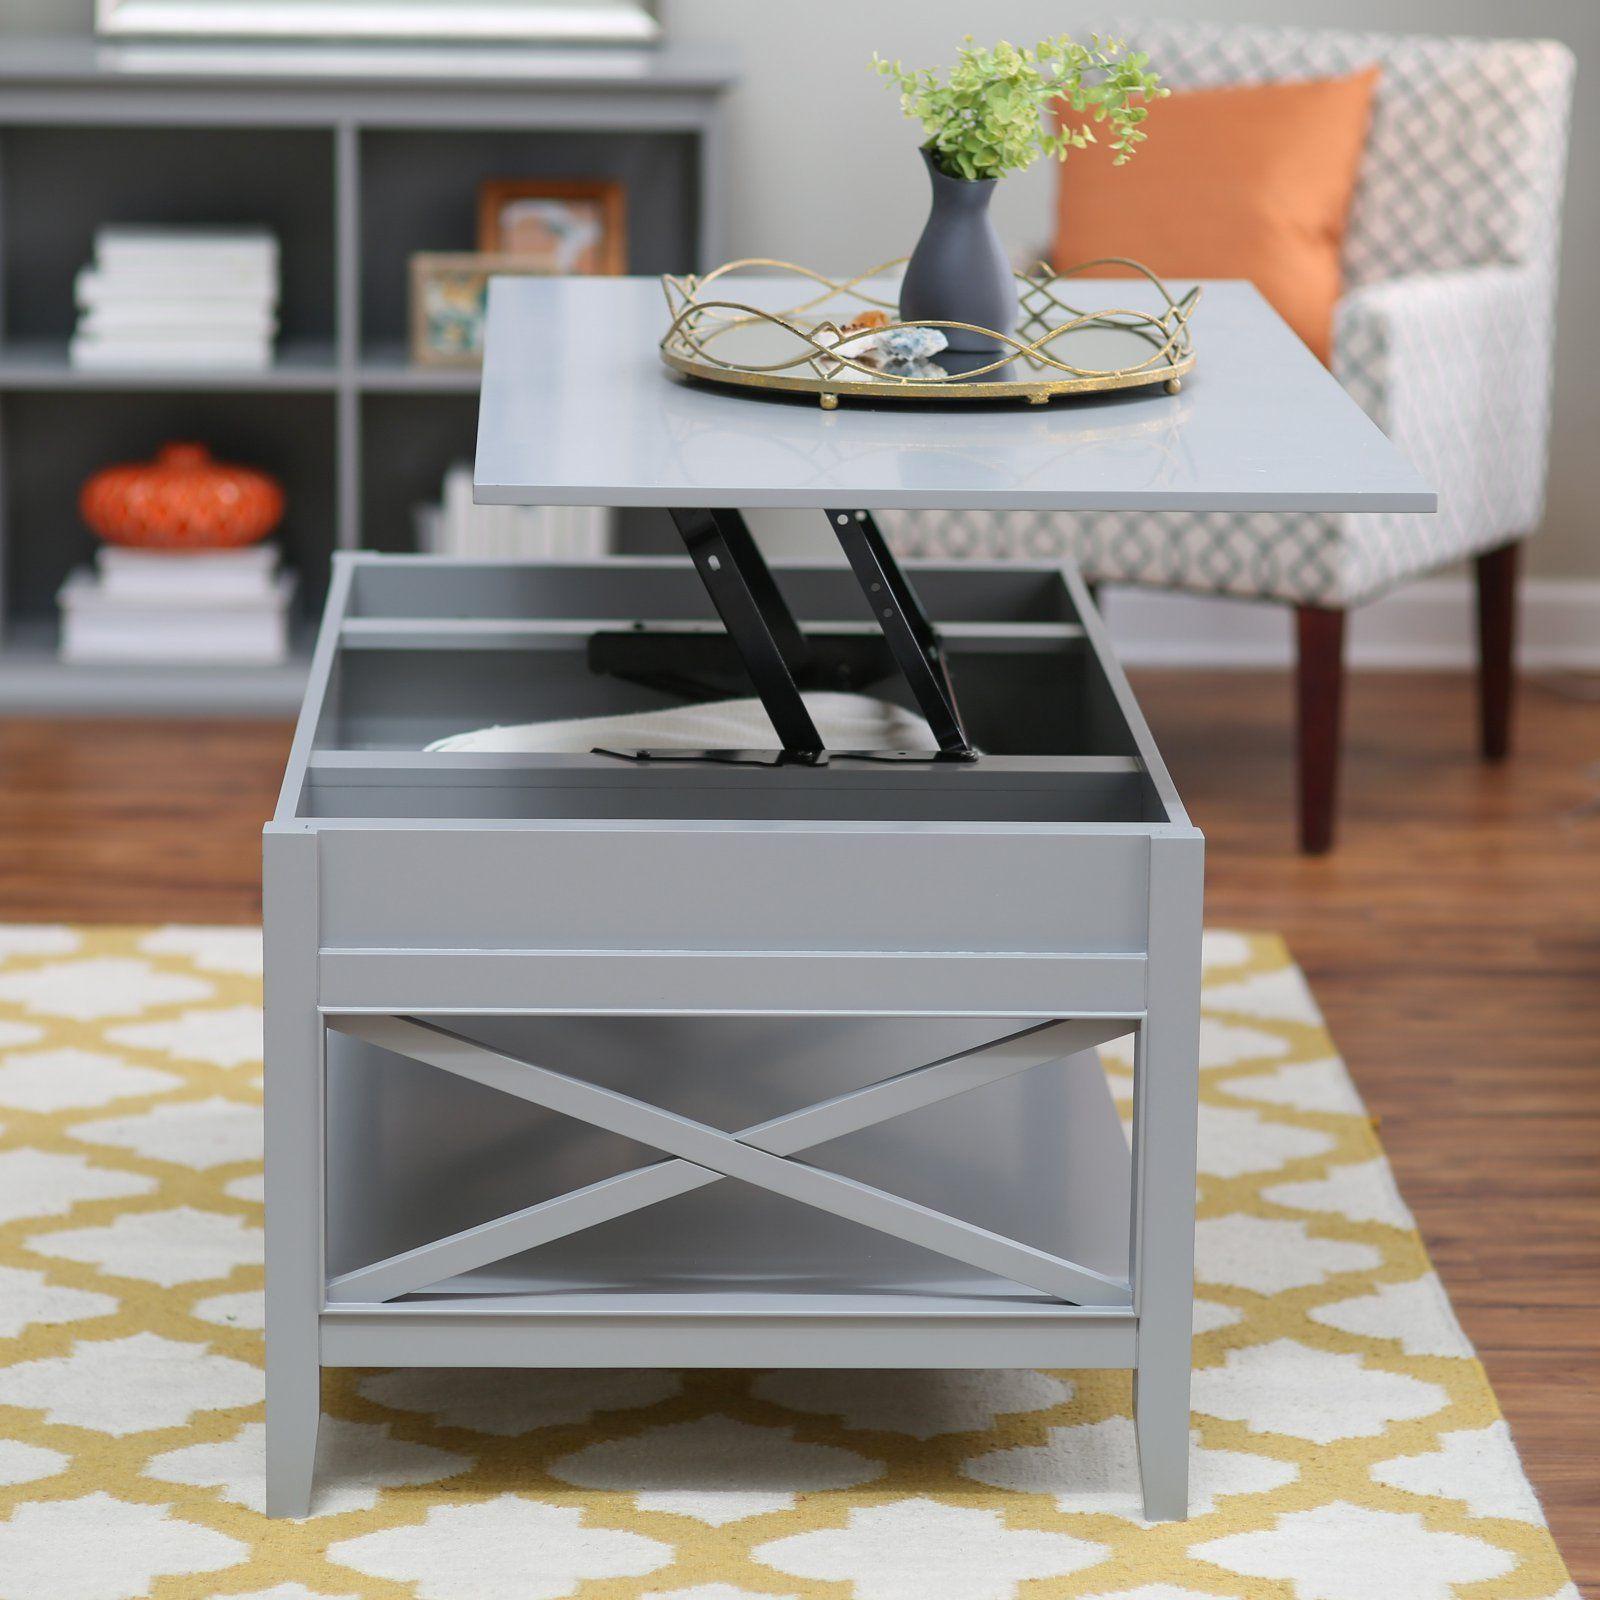 Belham Living Hampton Lift Top Coffee Table Gray Walmart Com In 2021 Coffee Table Grey Coffee Tables For Sale Coffee Table Inspiration [ 1600 x 1600 Pixel ]